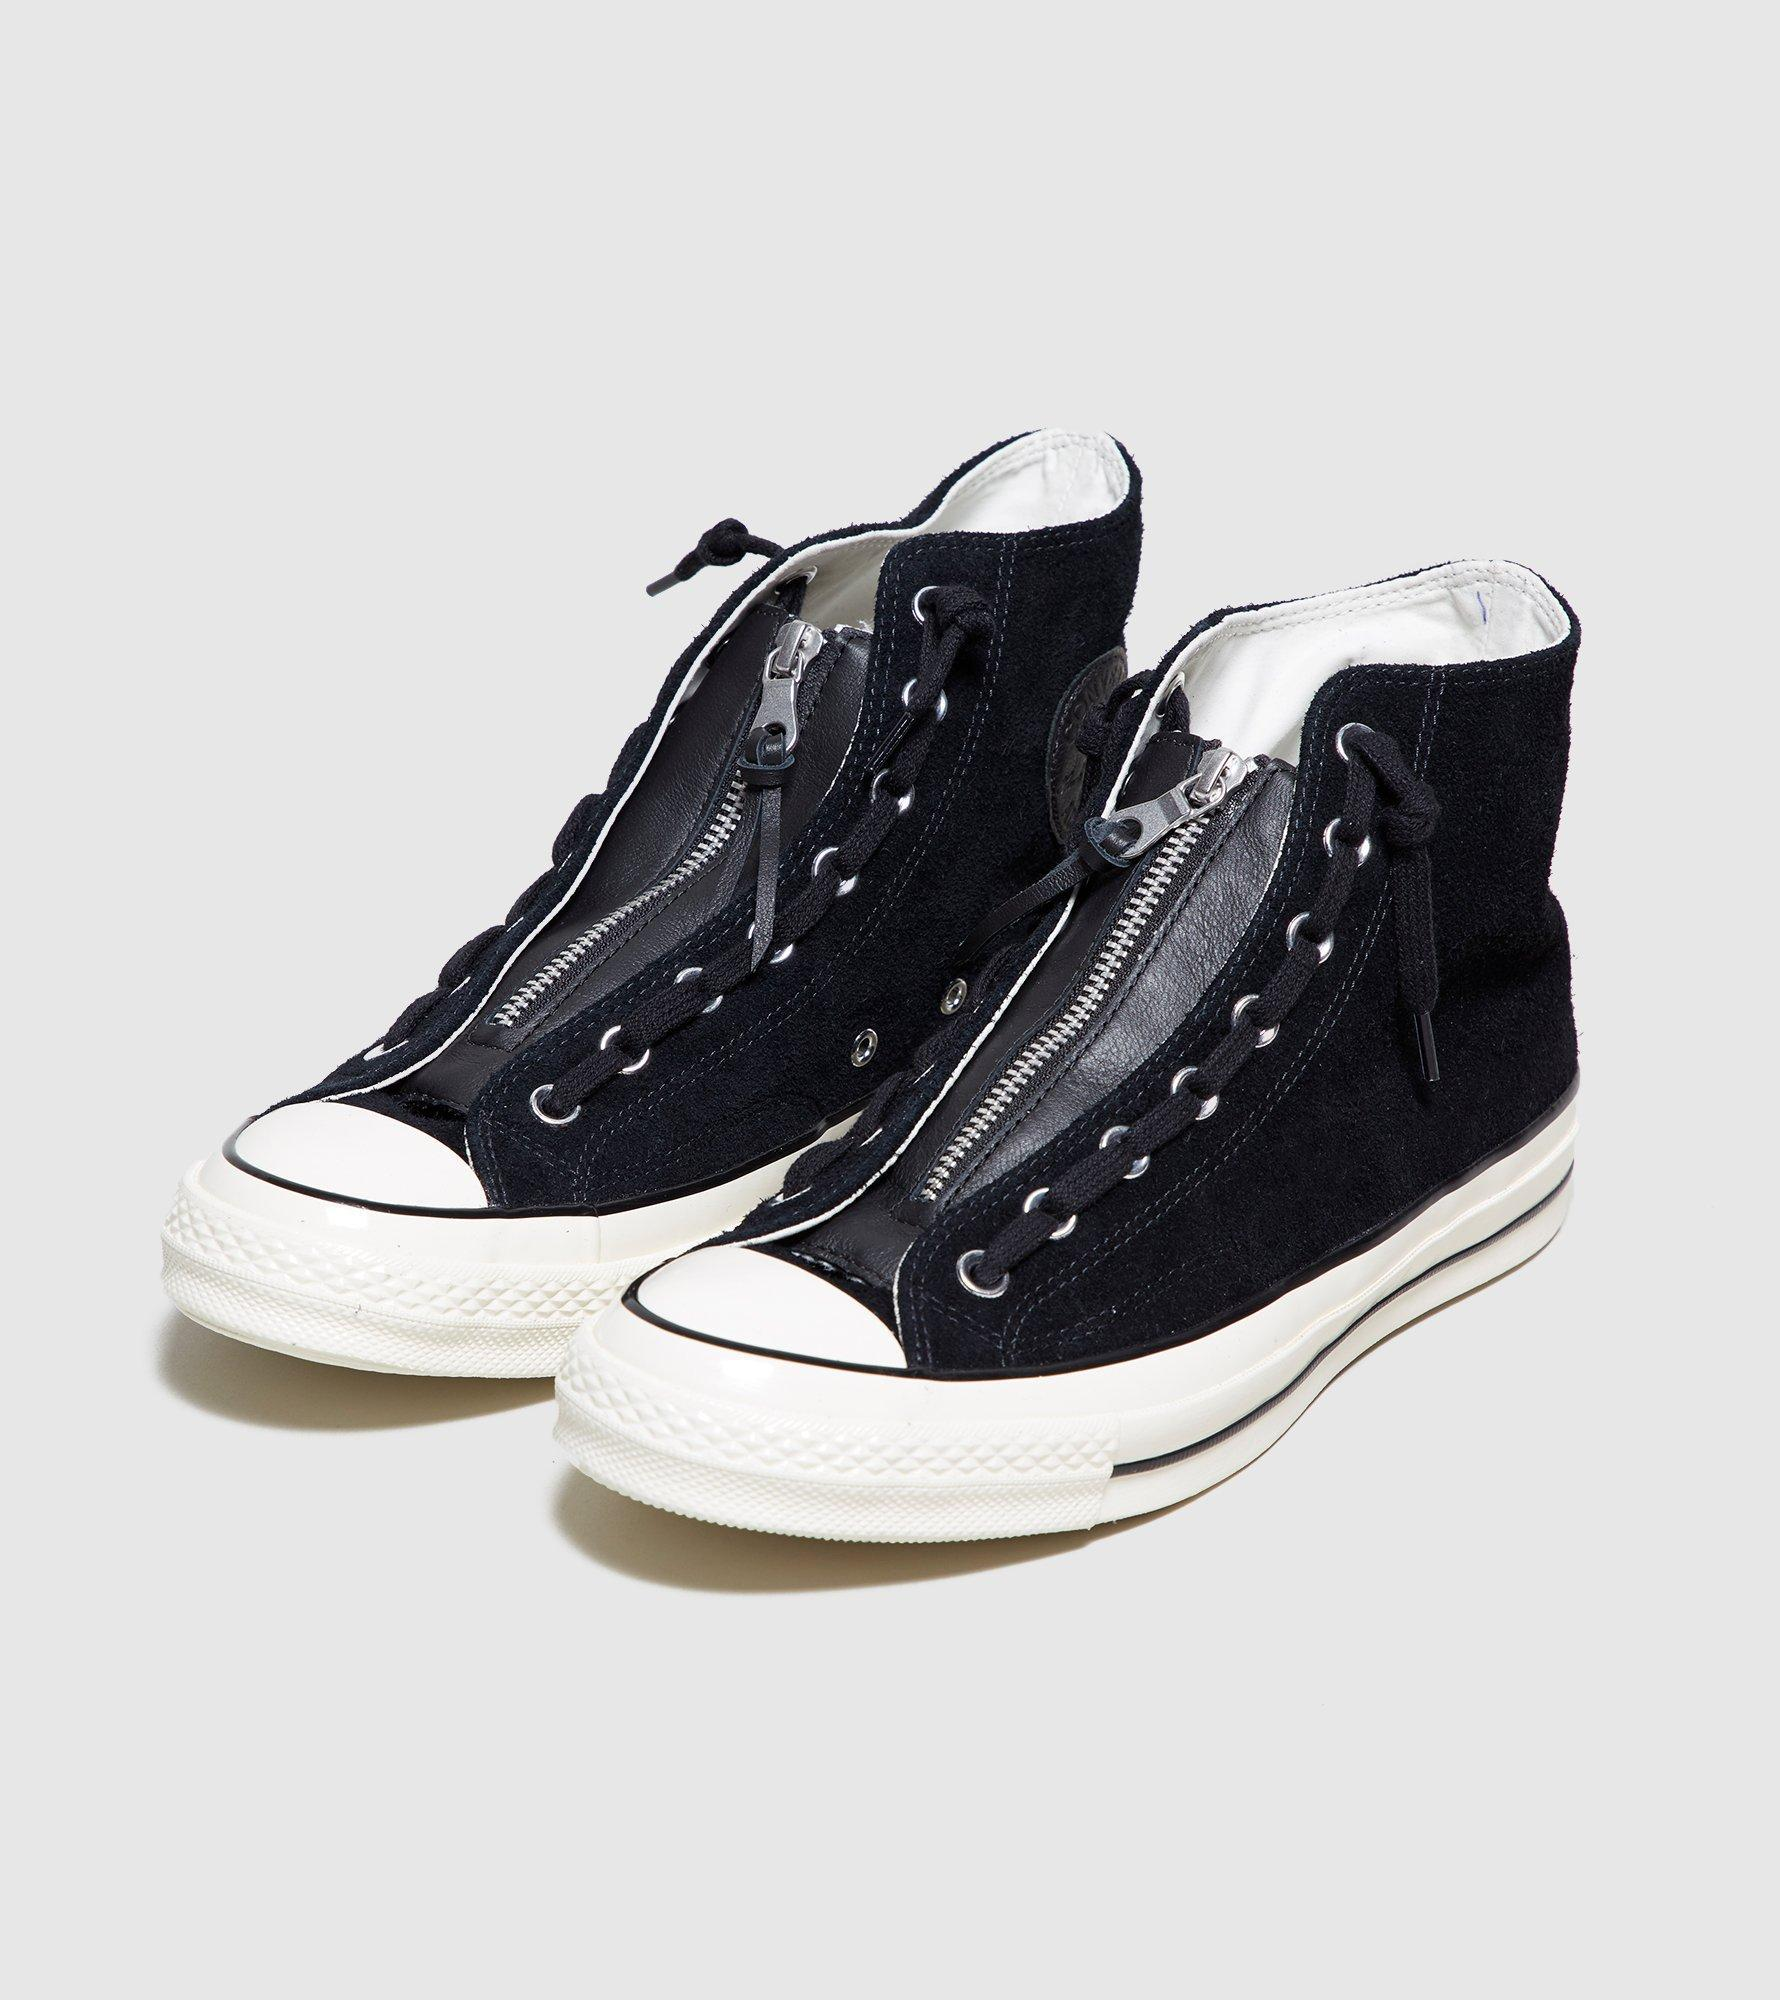 80fca5f23533 ... c8d74c08c0d Lyst - Converse Chuck Taylor All Star 70 Zip High in Black  for Men ...